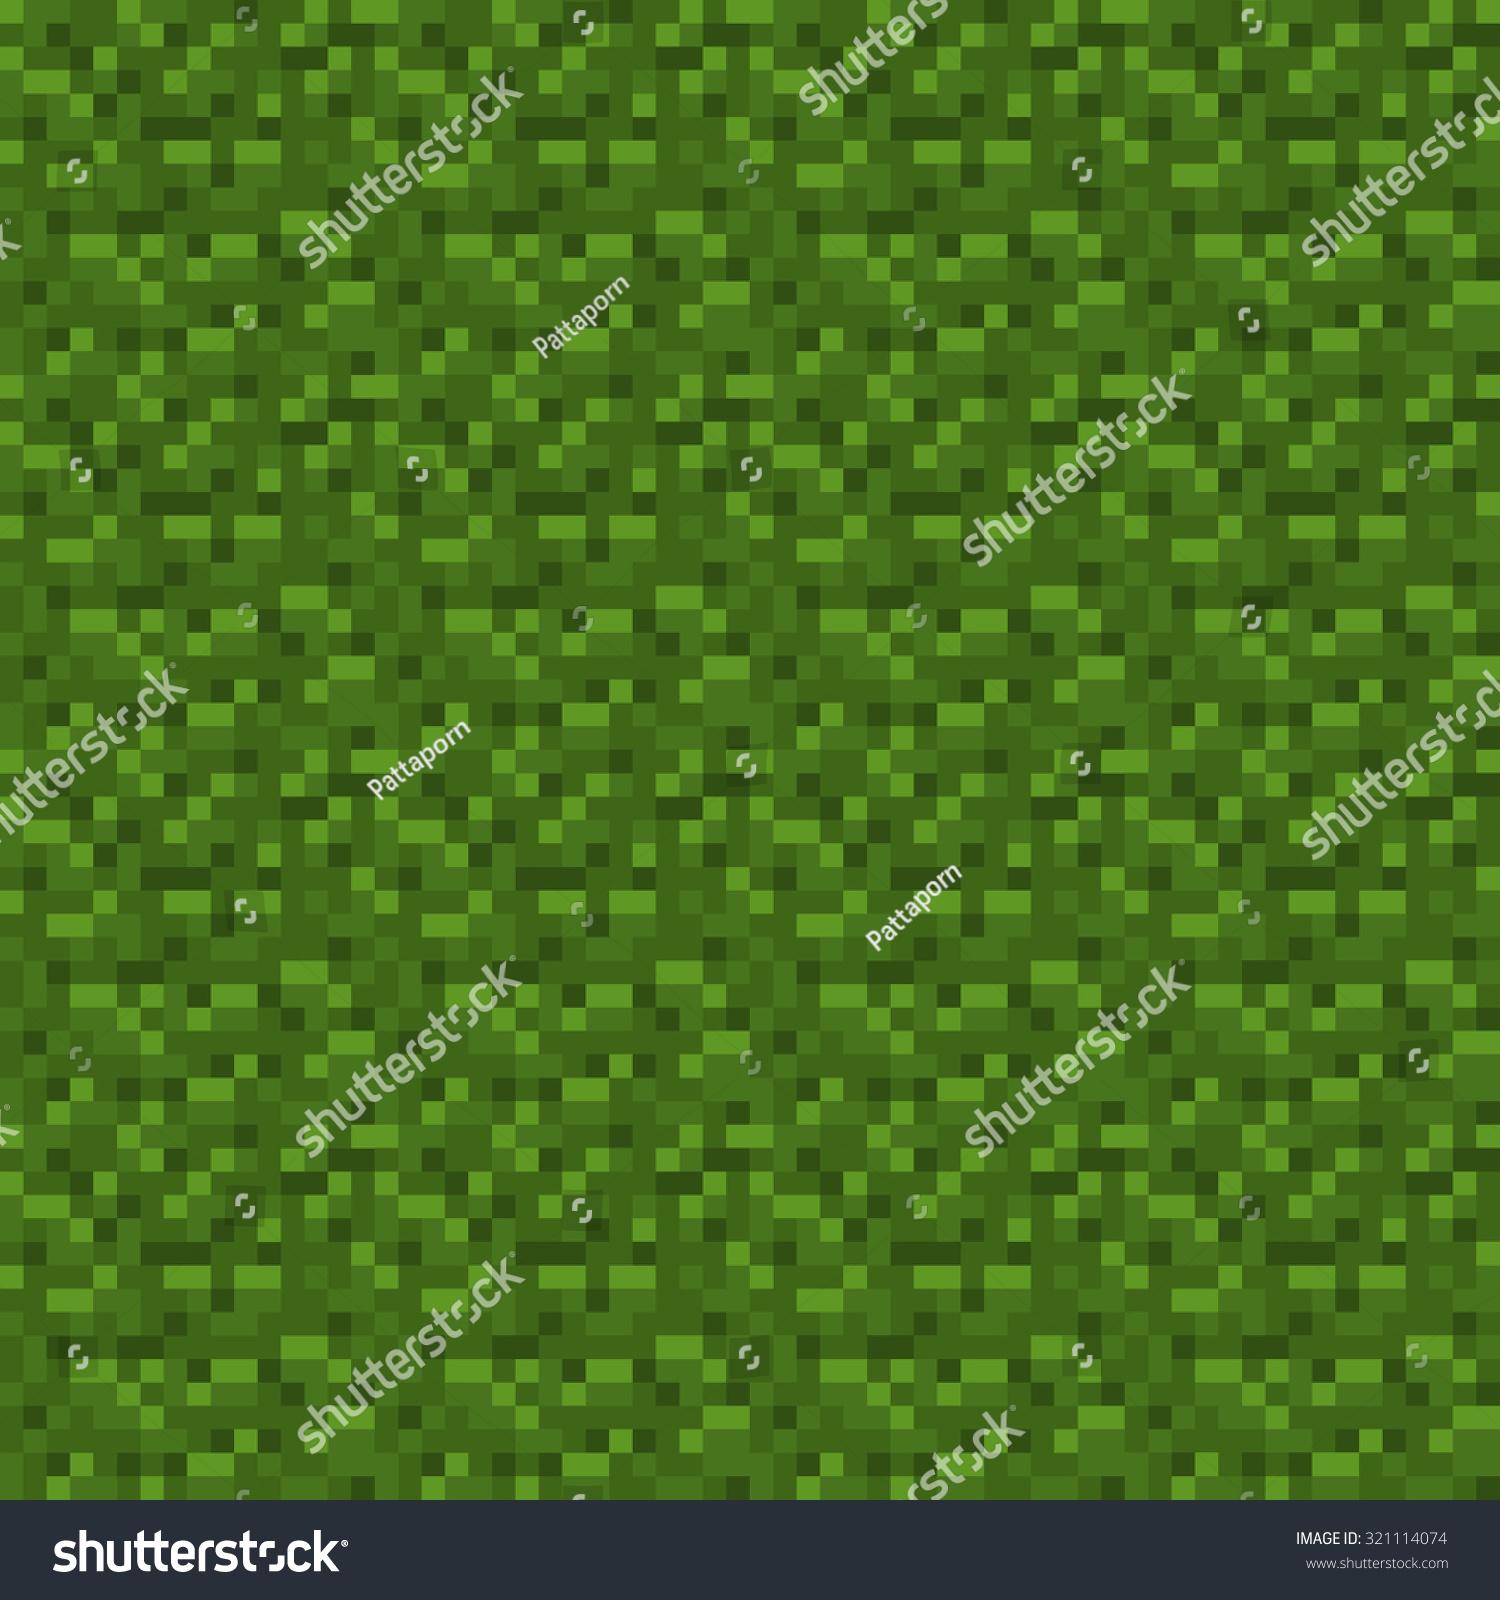 Abstract Dark Green Pixelated Pattern Seamless Stock